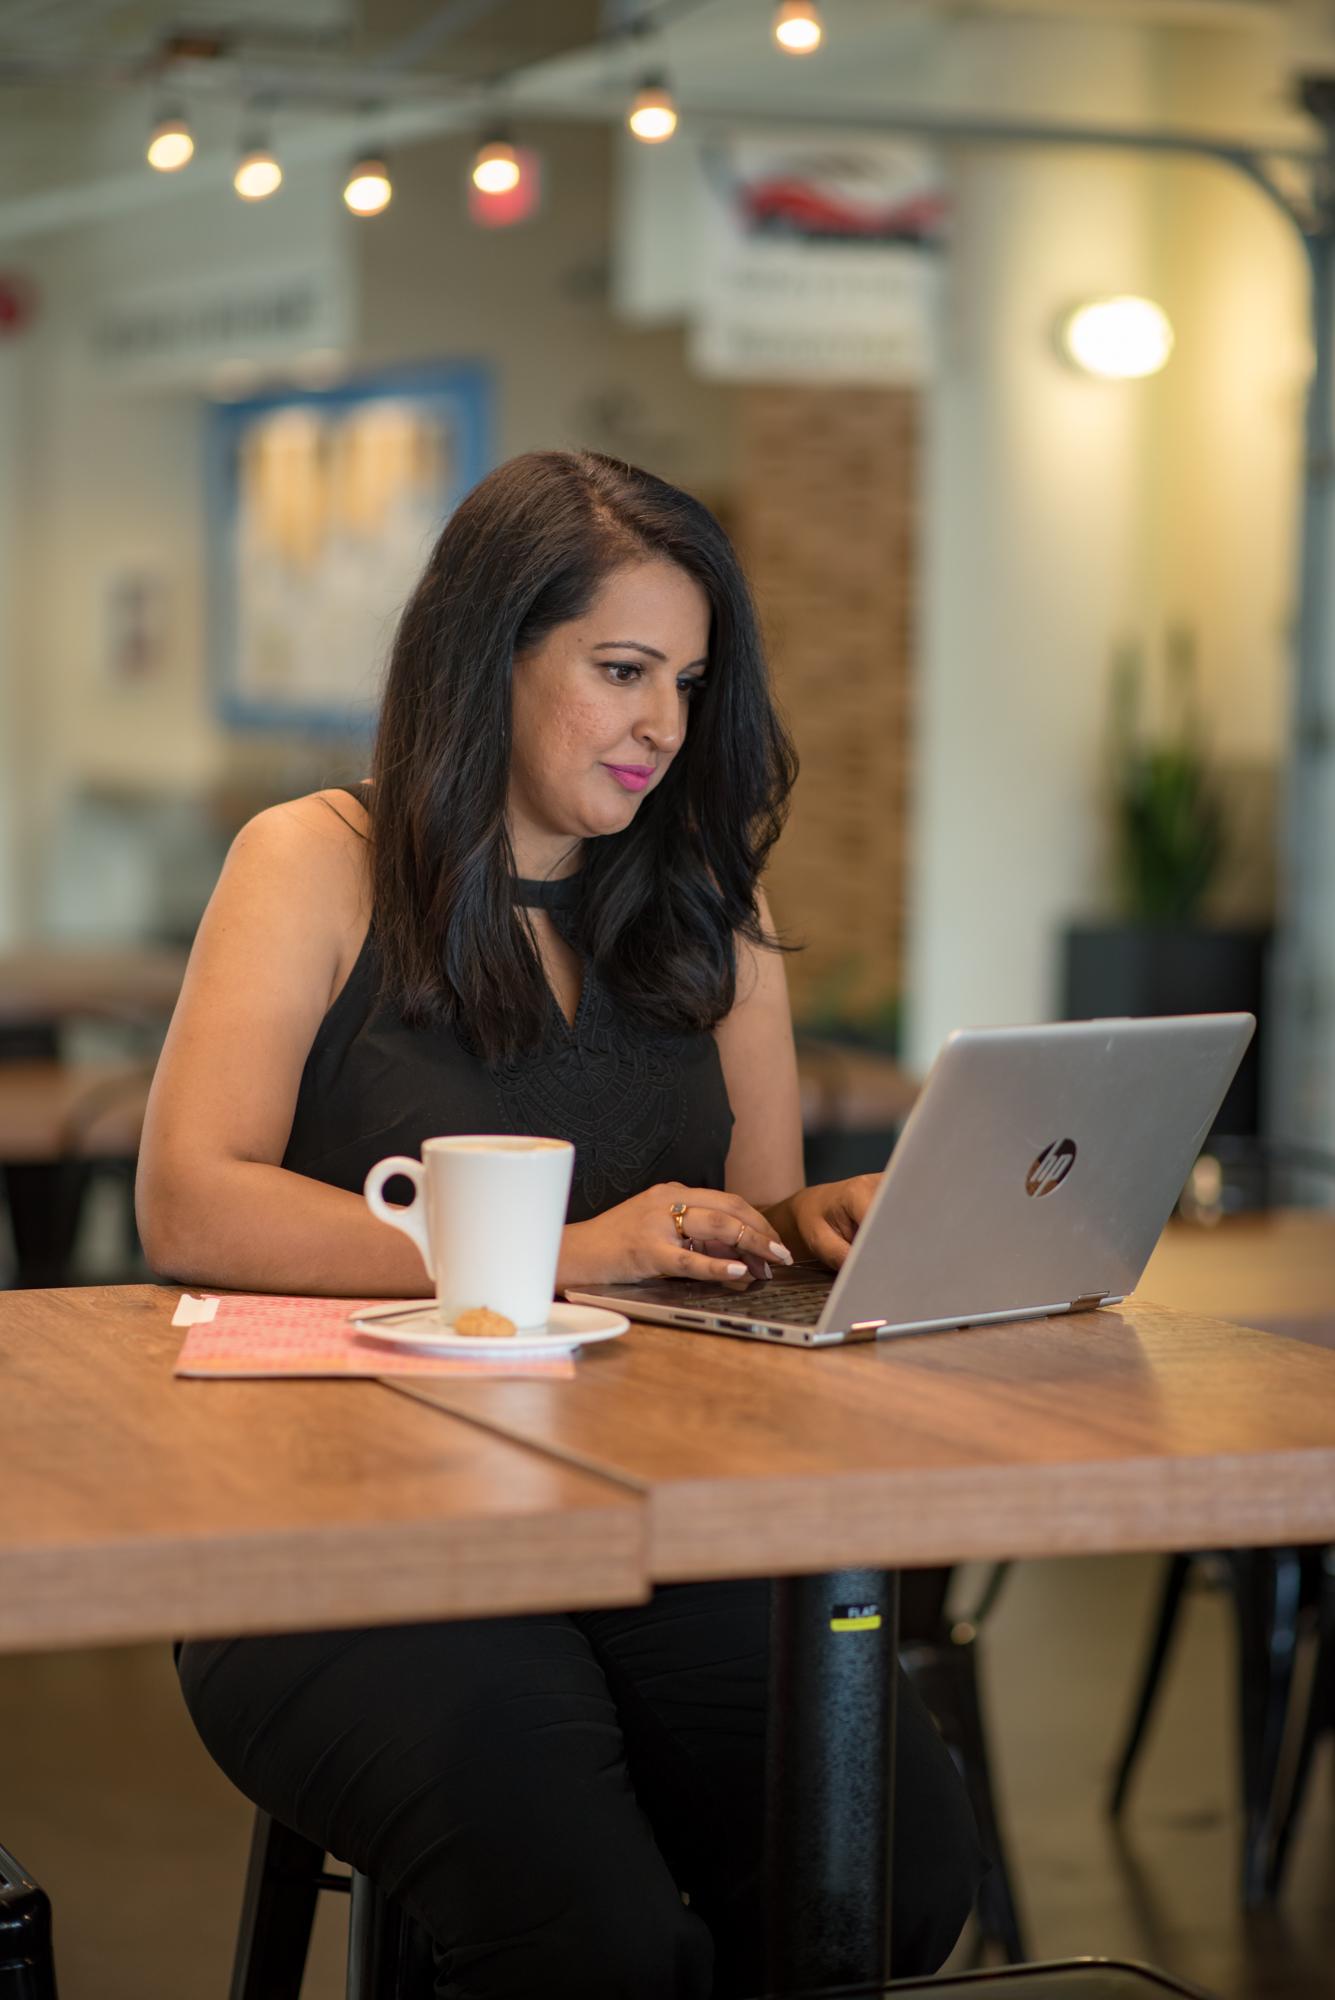 blog post ideas, finding blog post ideas